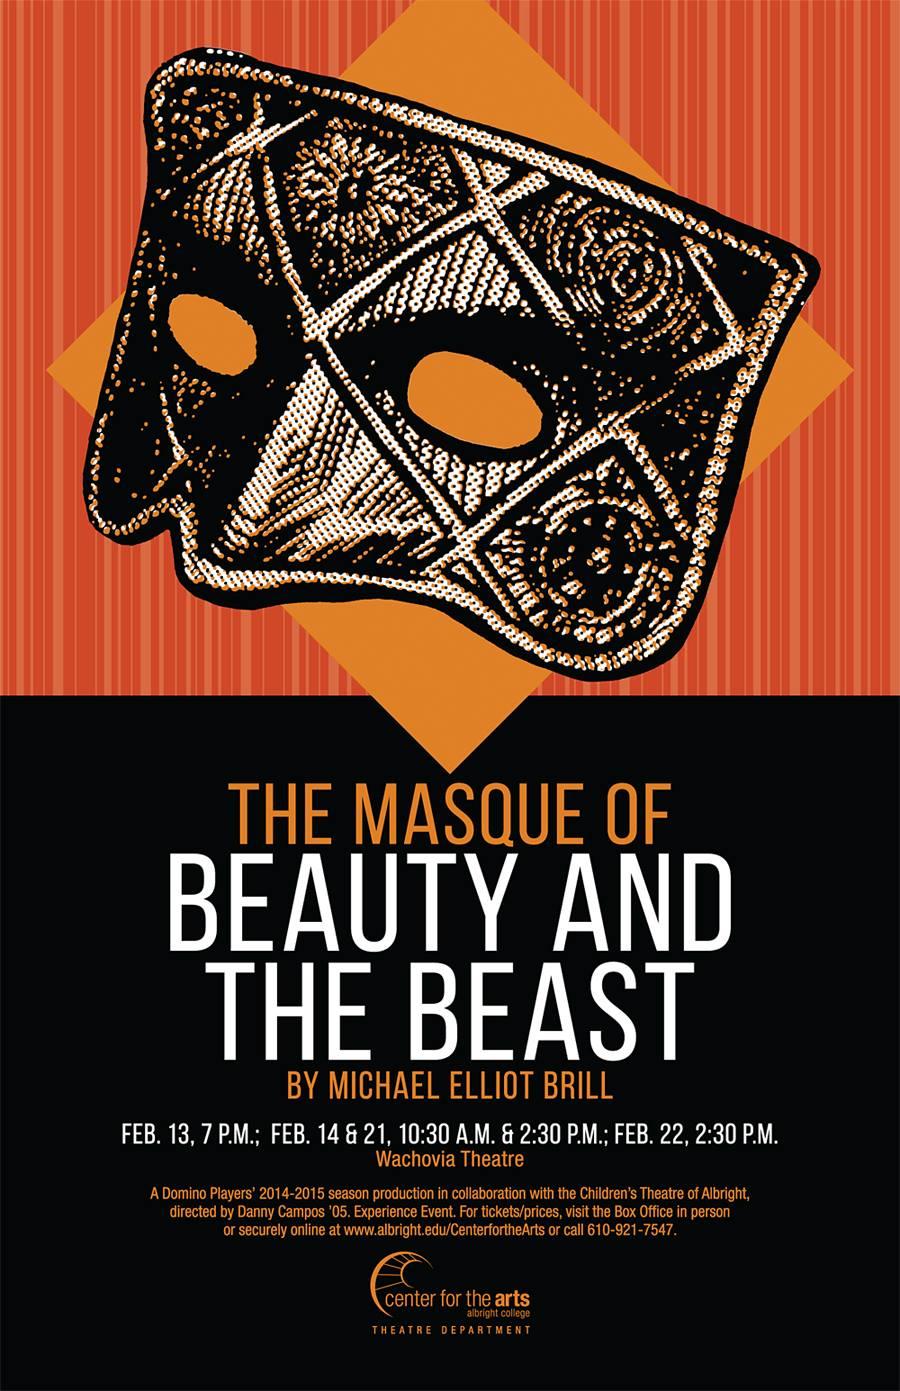 The Masque of Beauty & The Beast - Albright College, Reading, PApLAYWRIGHT: mICHAEL eLLIOT bRILLdIRECTOR: daNNY cAMPOSsCENIC dESIGNer:Perry KroegerlIGHTING dESIGNer:Wayne E. VettlesoncOSTUME dESIGNer:pAULA tRIMPEYphotos by John Pankratz